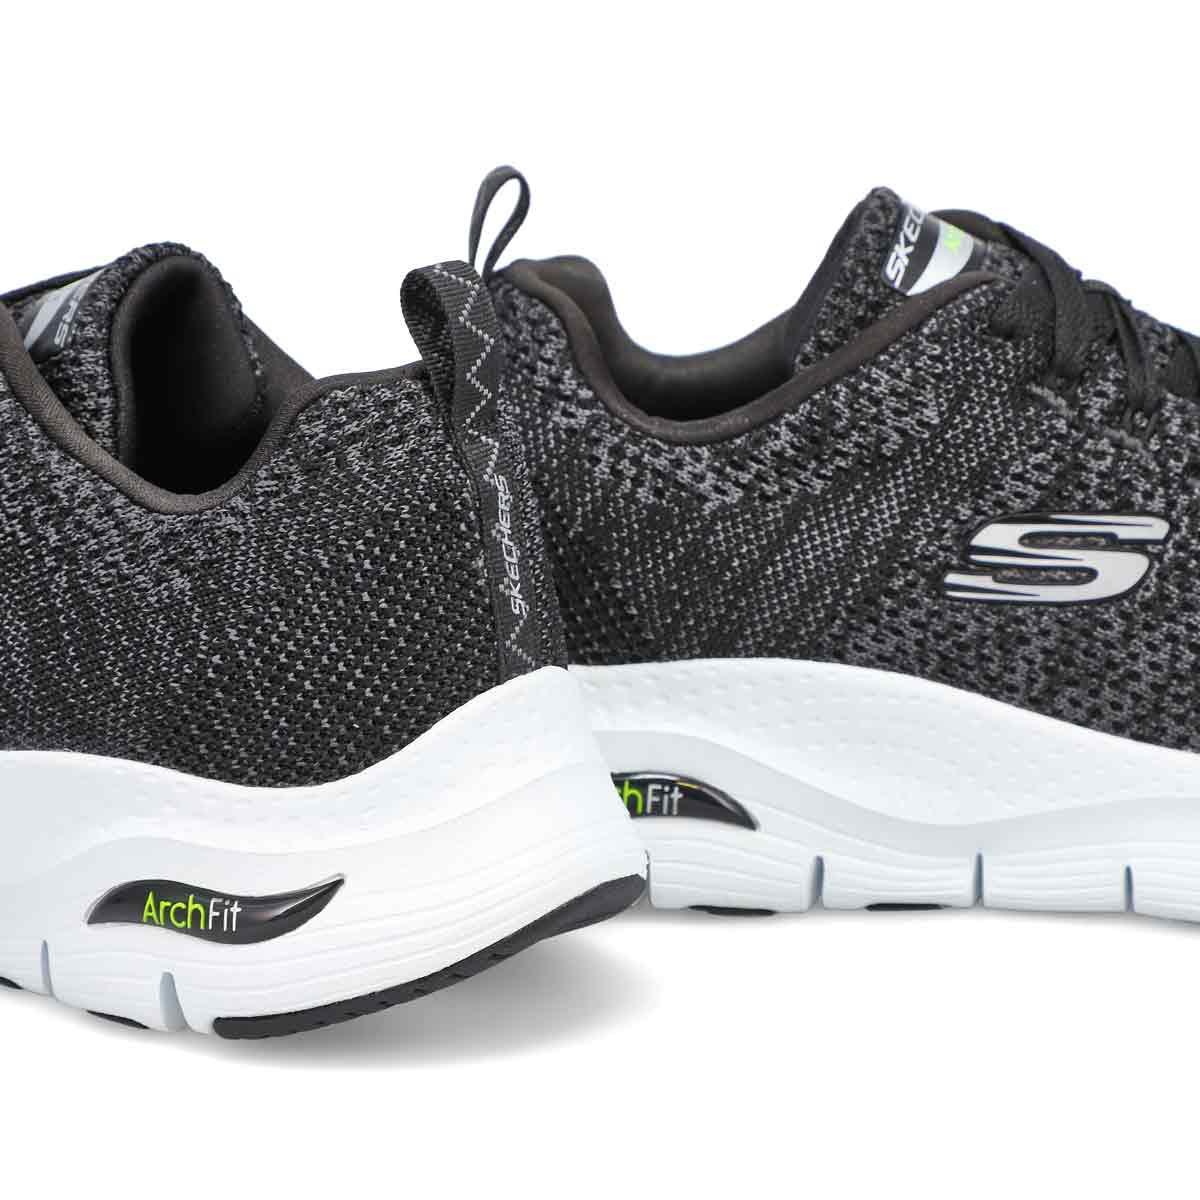 Men's Arch Fit Paradyme Sneakers - Black/White